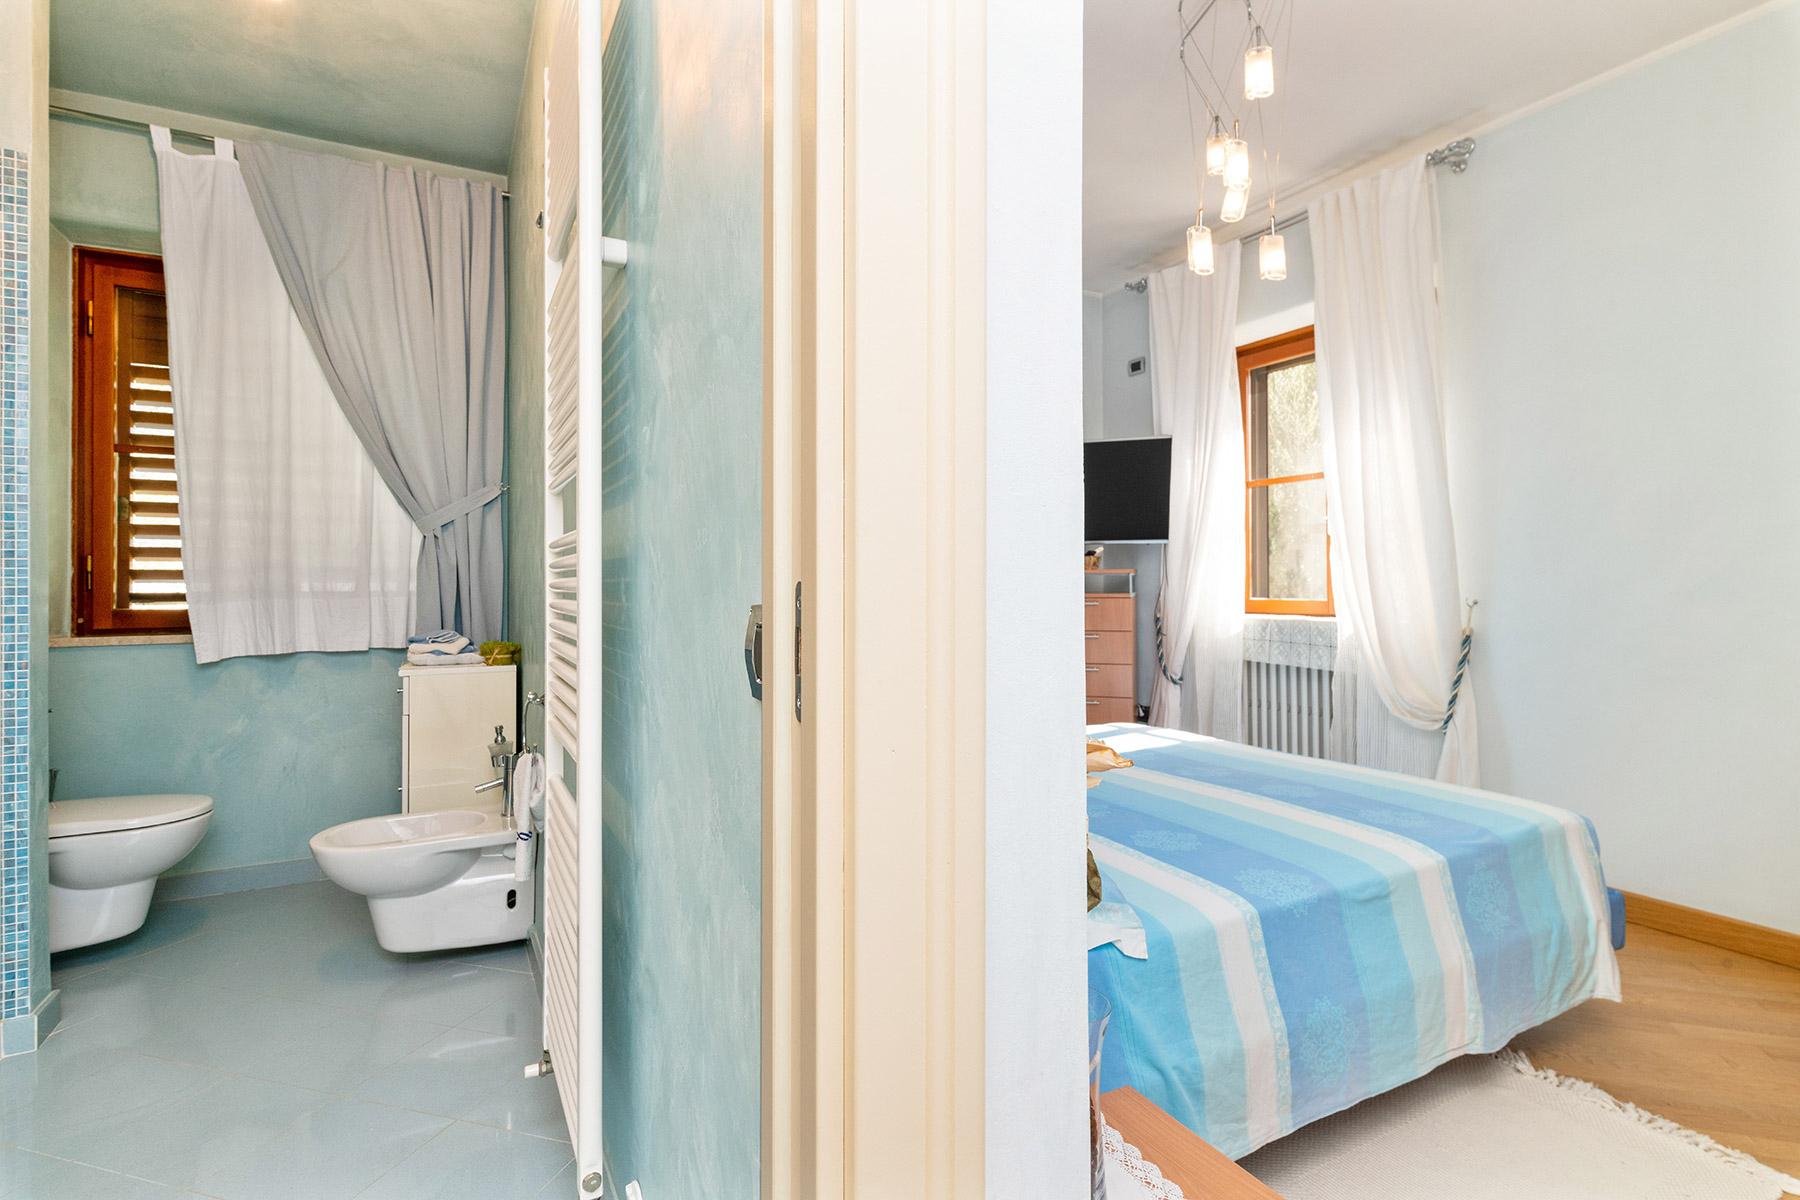 Villa in Vendita a Sirmione: 5 locali, 500 mq - Foto 23